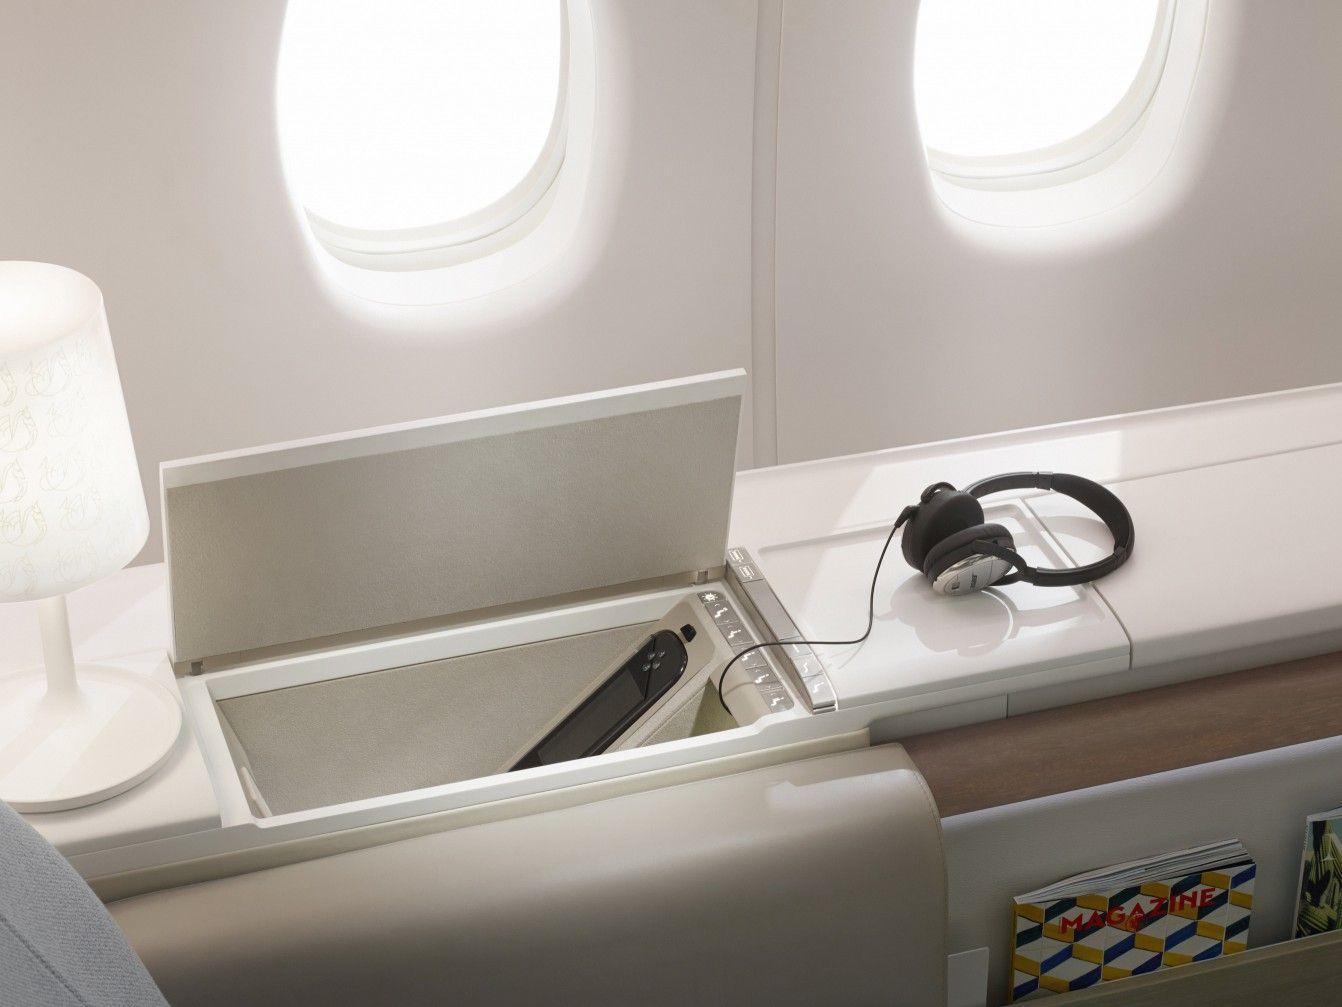 Priestmangoode Air France La Premiere Seat Control Aircraft